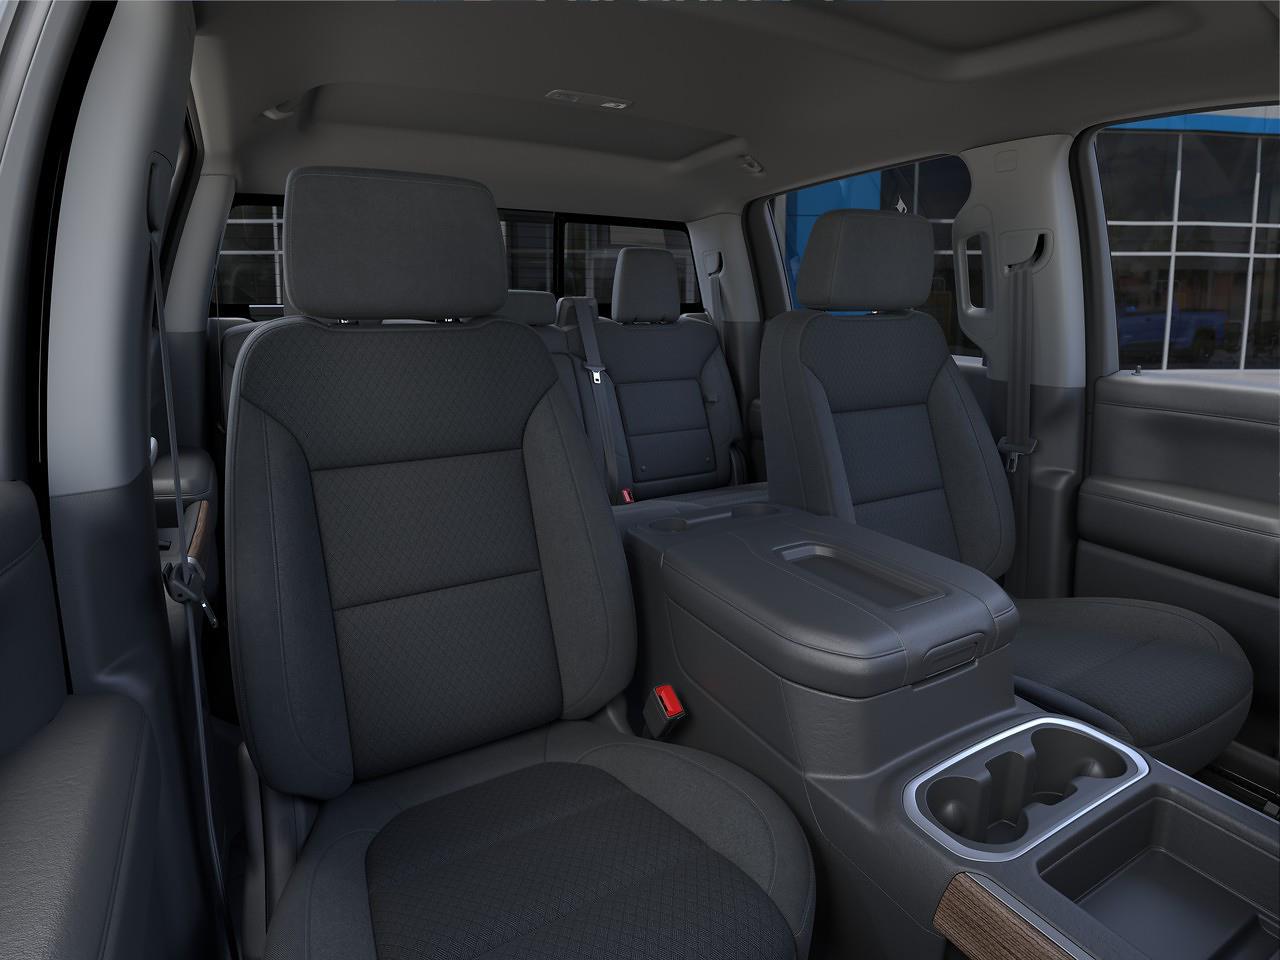 2021 Chevrolet Silverado 1500 Crew Cab 4x4, Pickup #Q210130 - photo 54